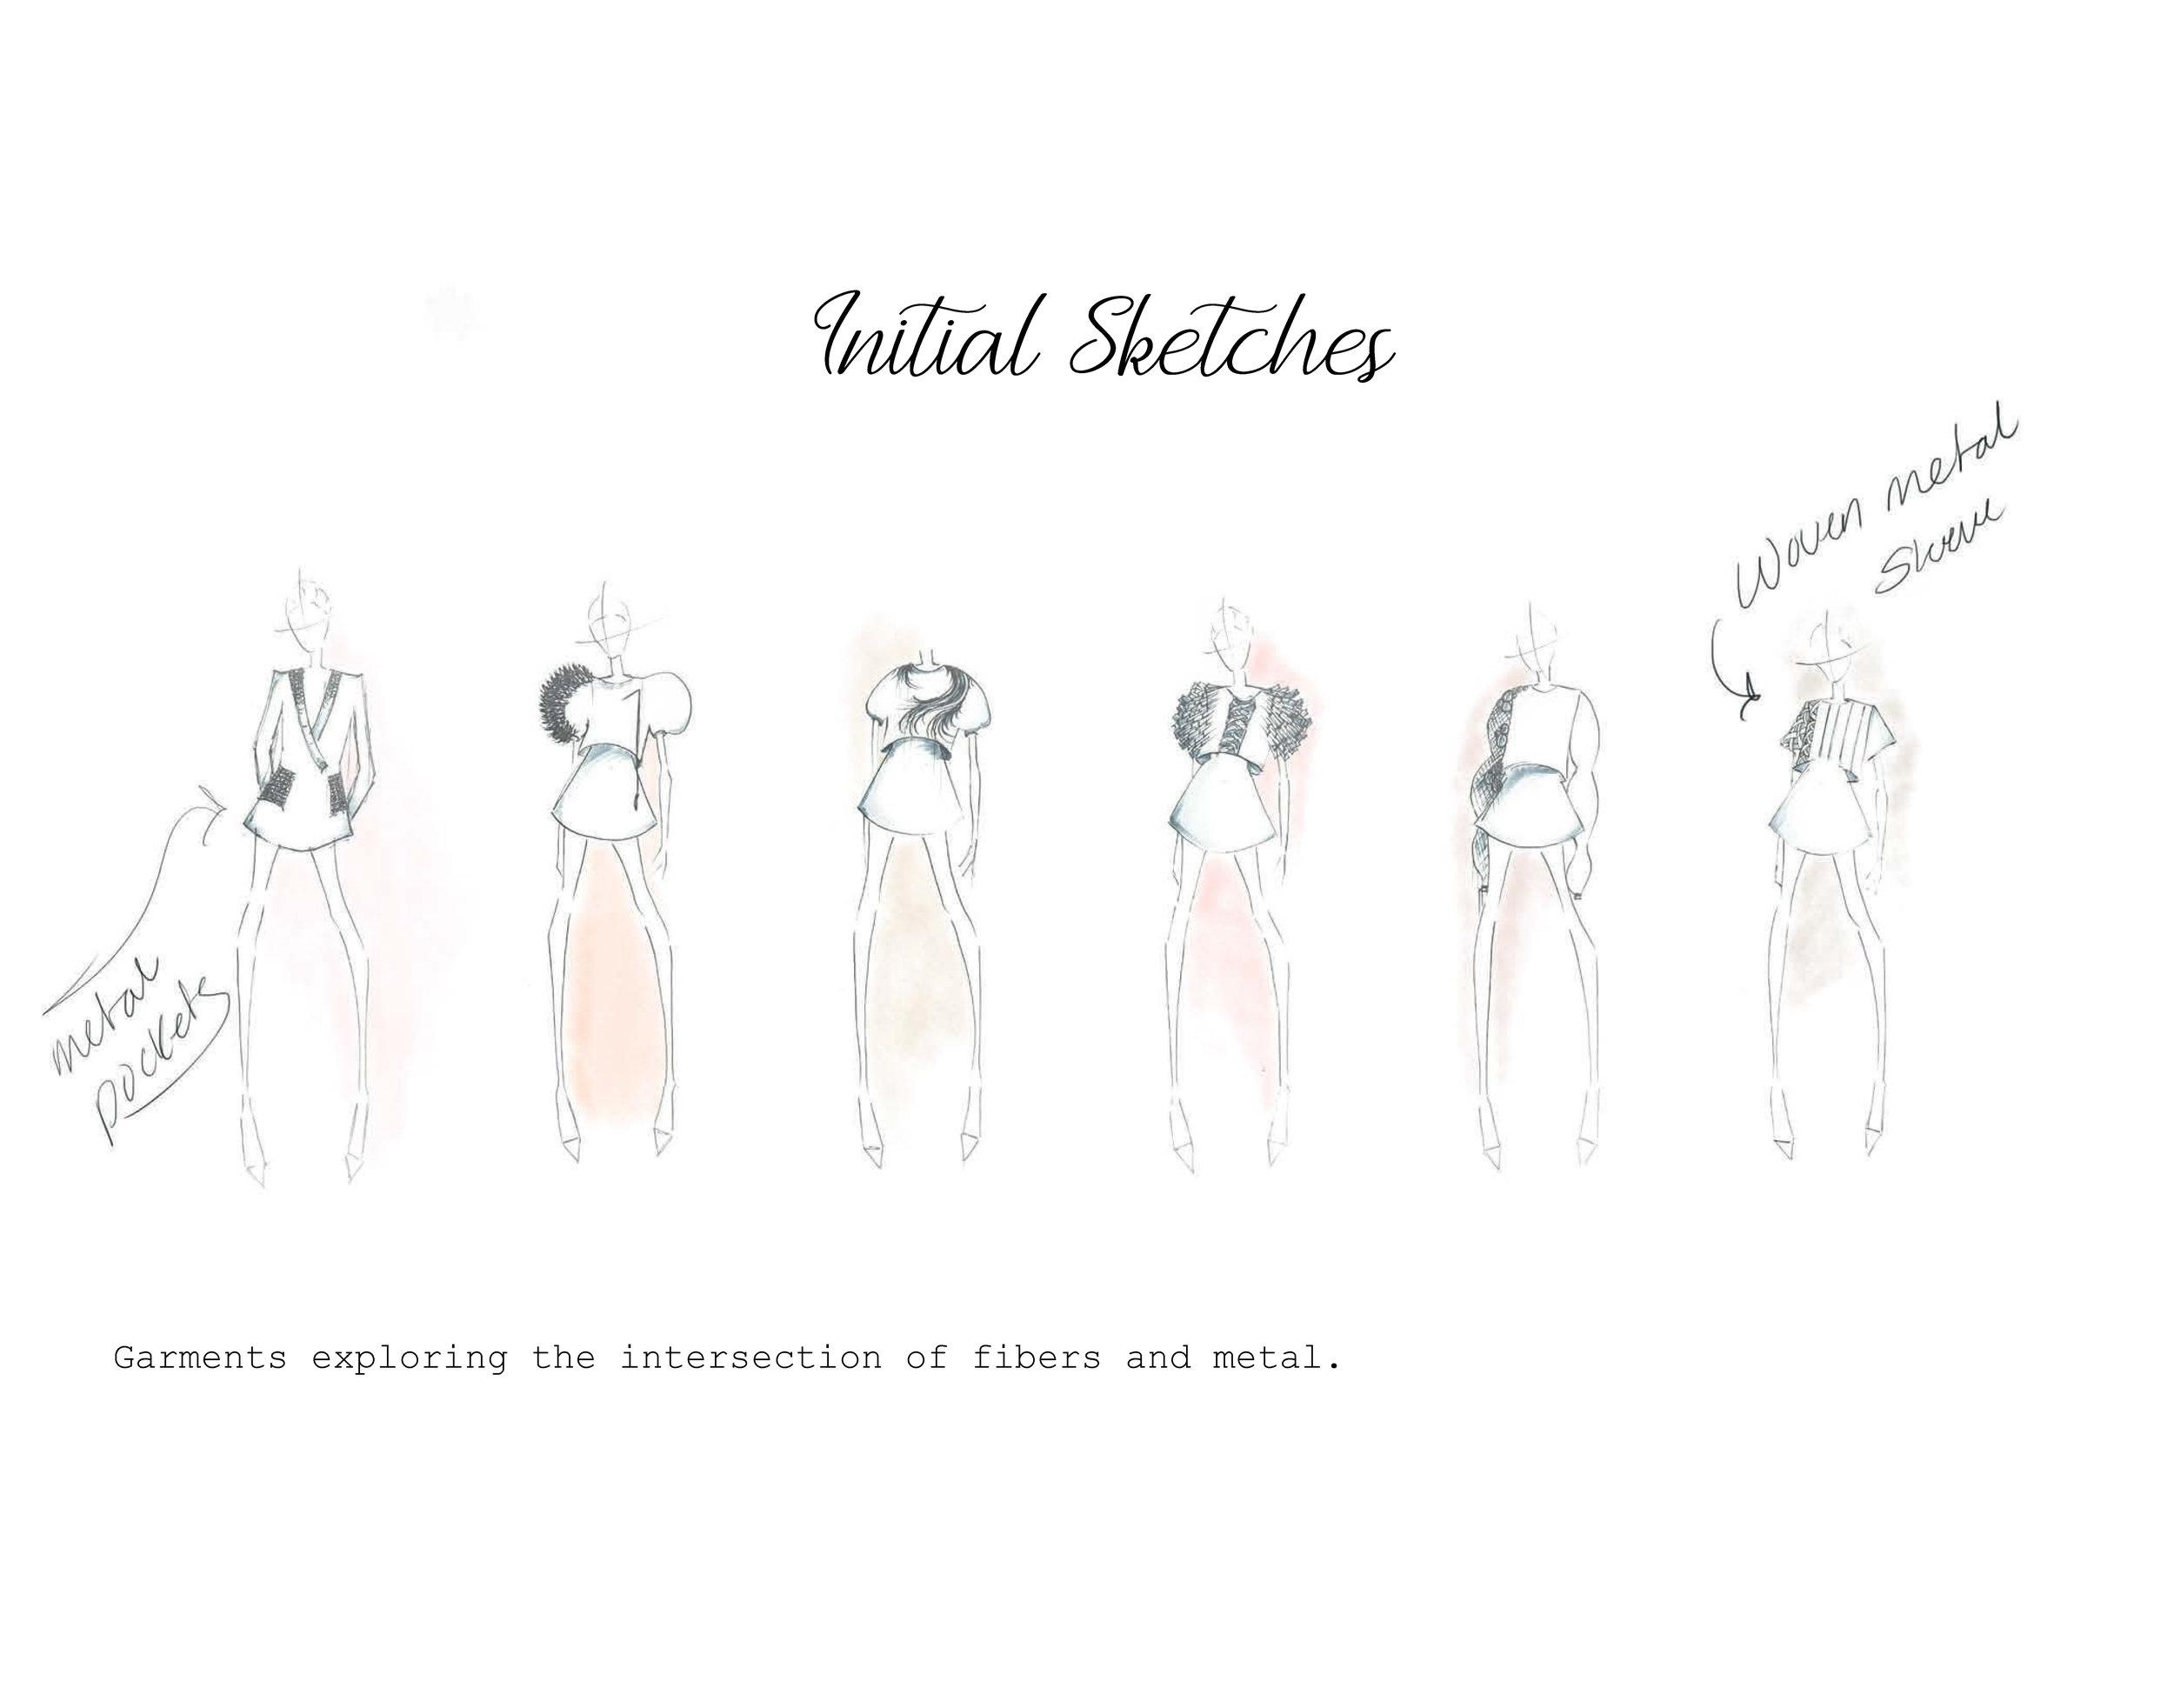 Swanson_Sarah_ Eudemonia Initial Sketches